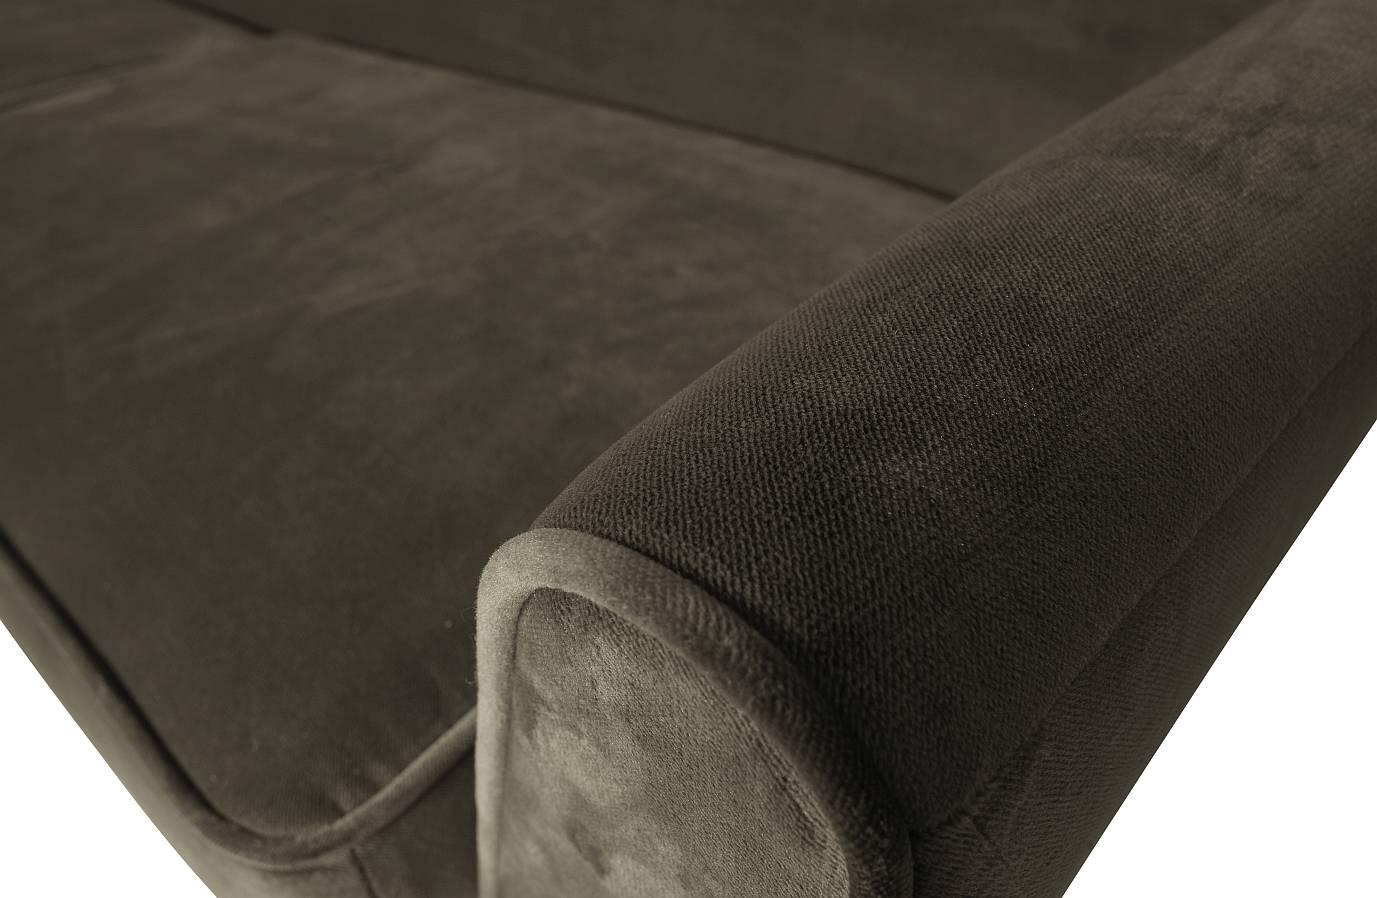 Woood Rocco Bank XL 4-zits - Breedte 230 Cm - Fluweel Warm Groen